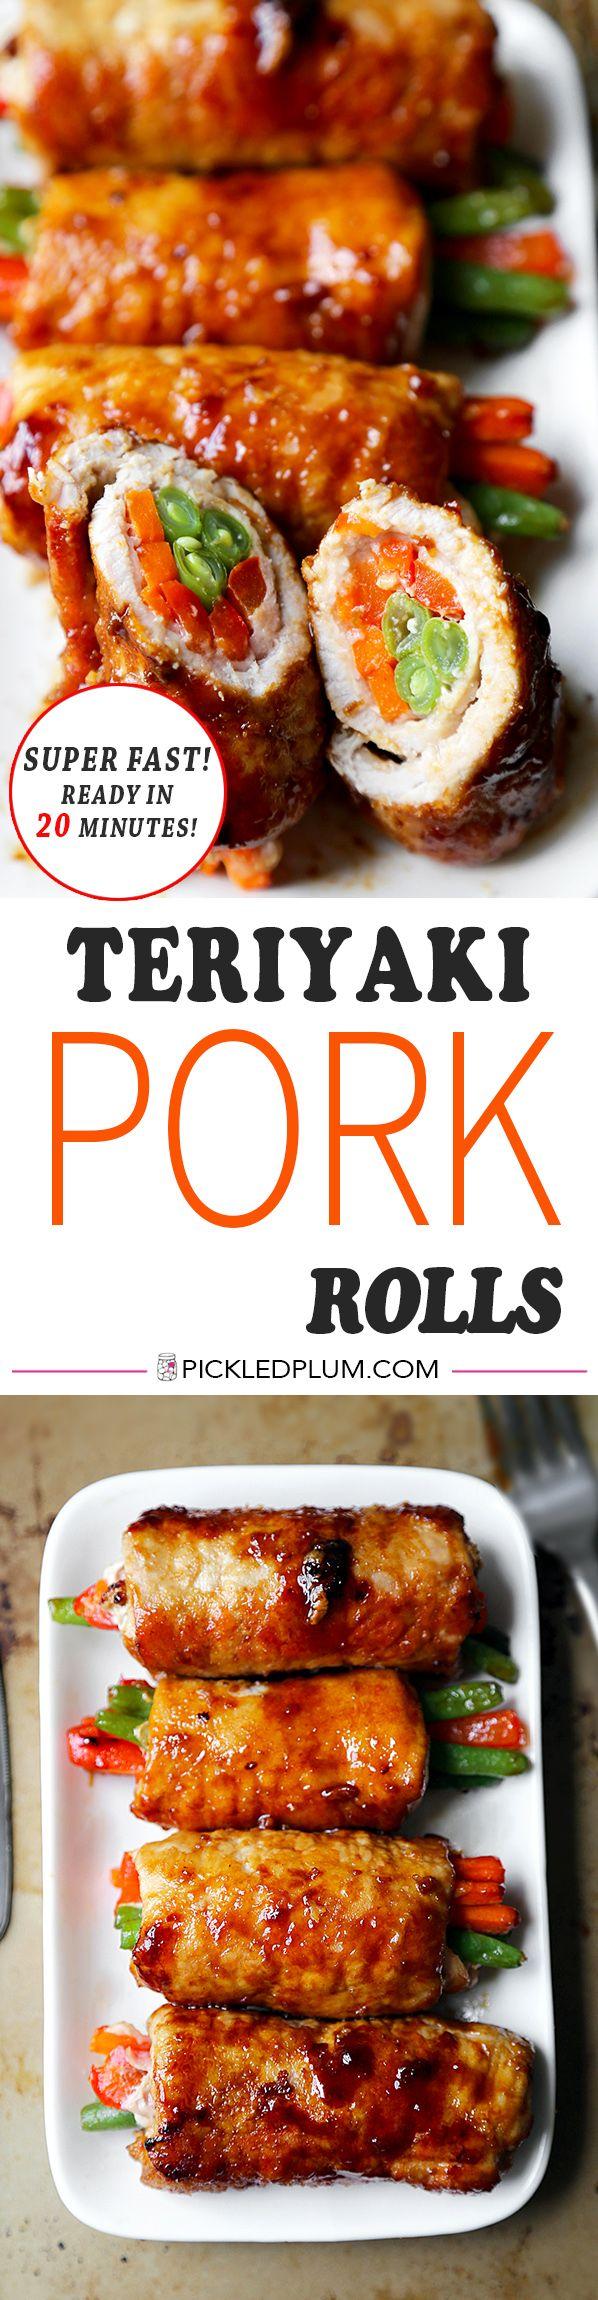 Teriyaki Pork Rolls - Sweet & savory teriyaki pork rolls filled with veggies make these pork rolls easy for kids to love! Recipe, easy, healthy, meat, main   pickledplum.com